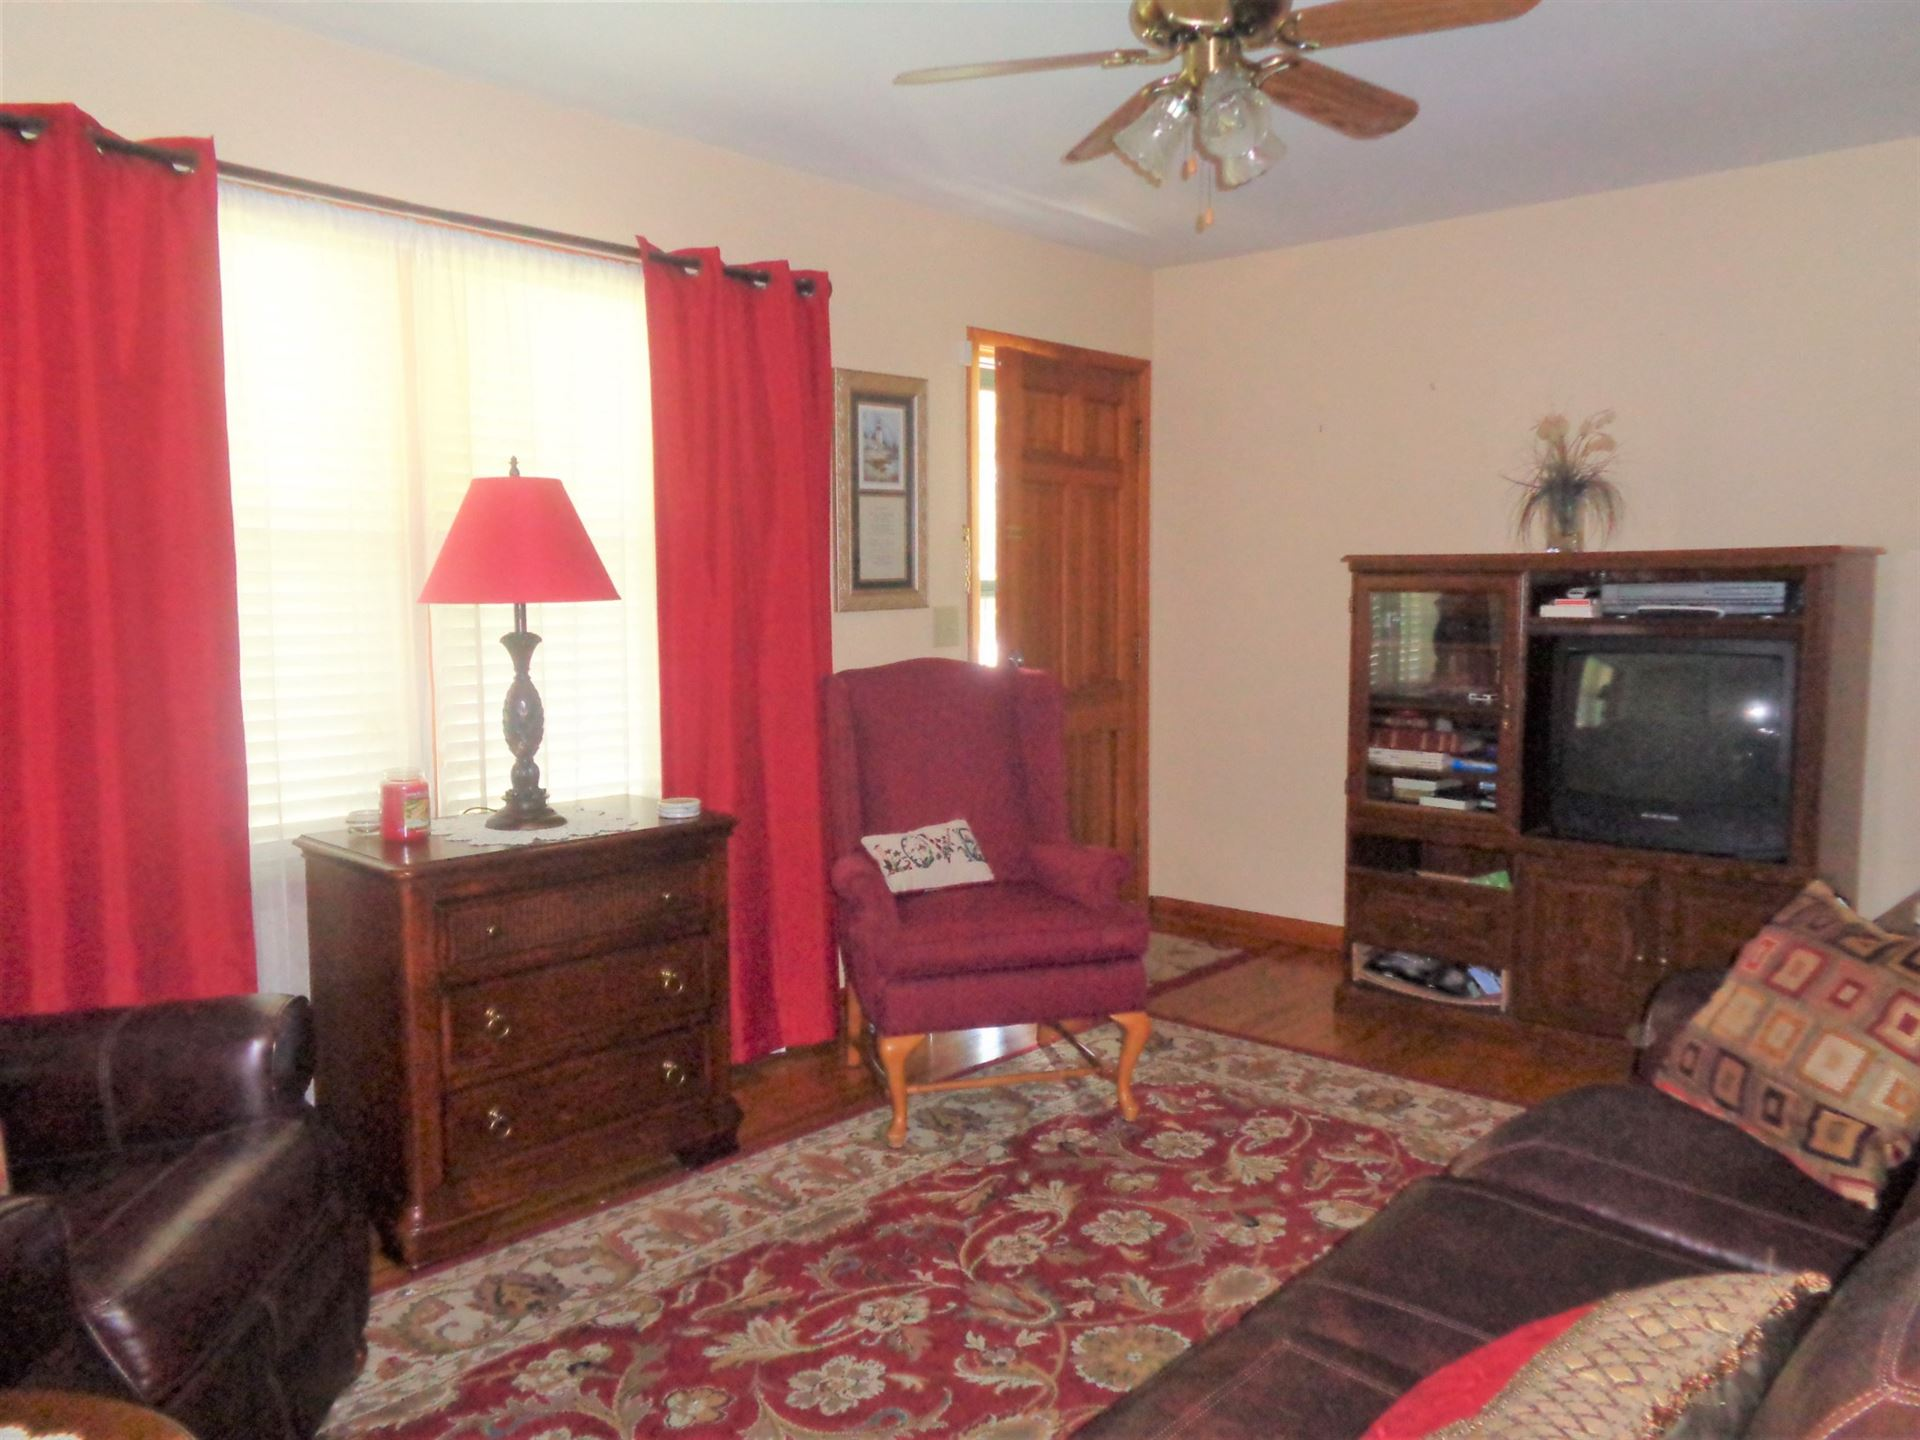 Photo of 702 7th St, Lawrenceburg, TN 38464 (MLS # 2175169)